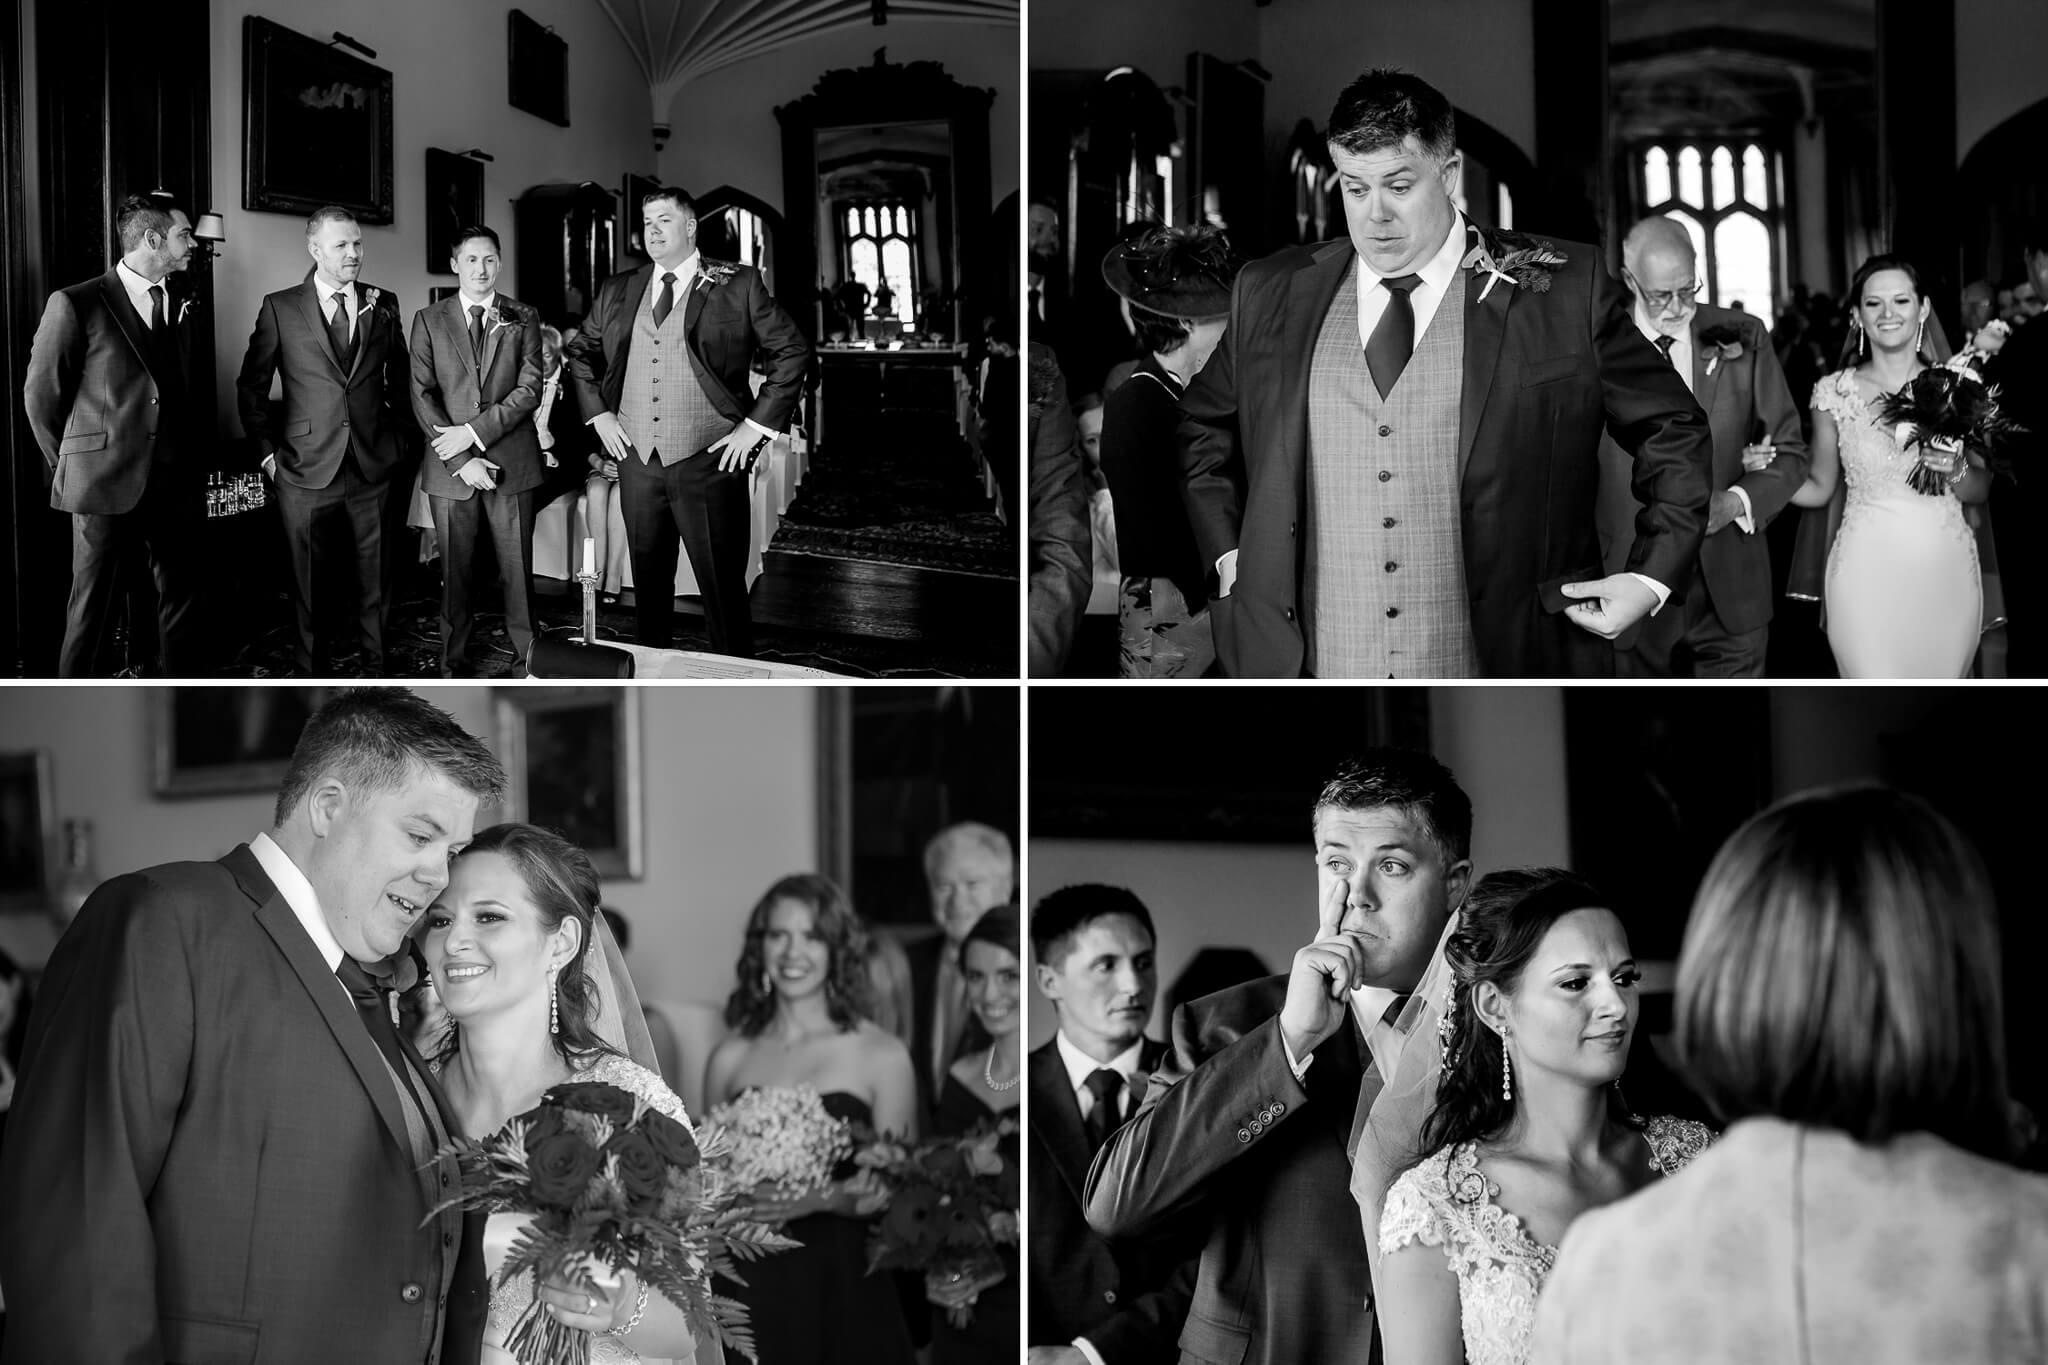 duns-castle-wedding-photograper-scotland-stanbury-photography-009